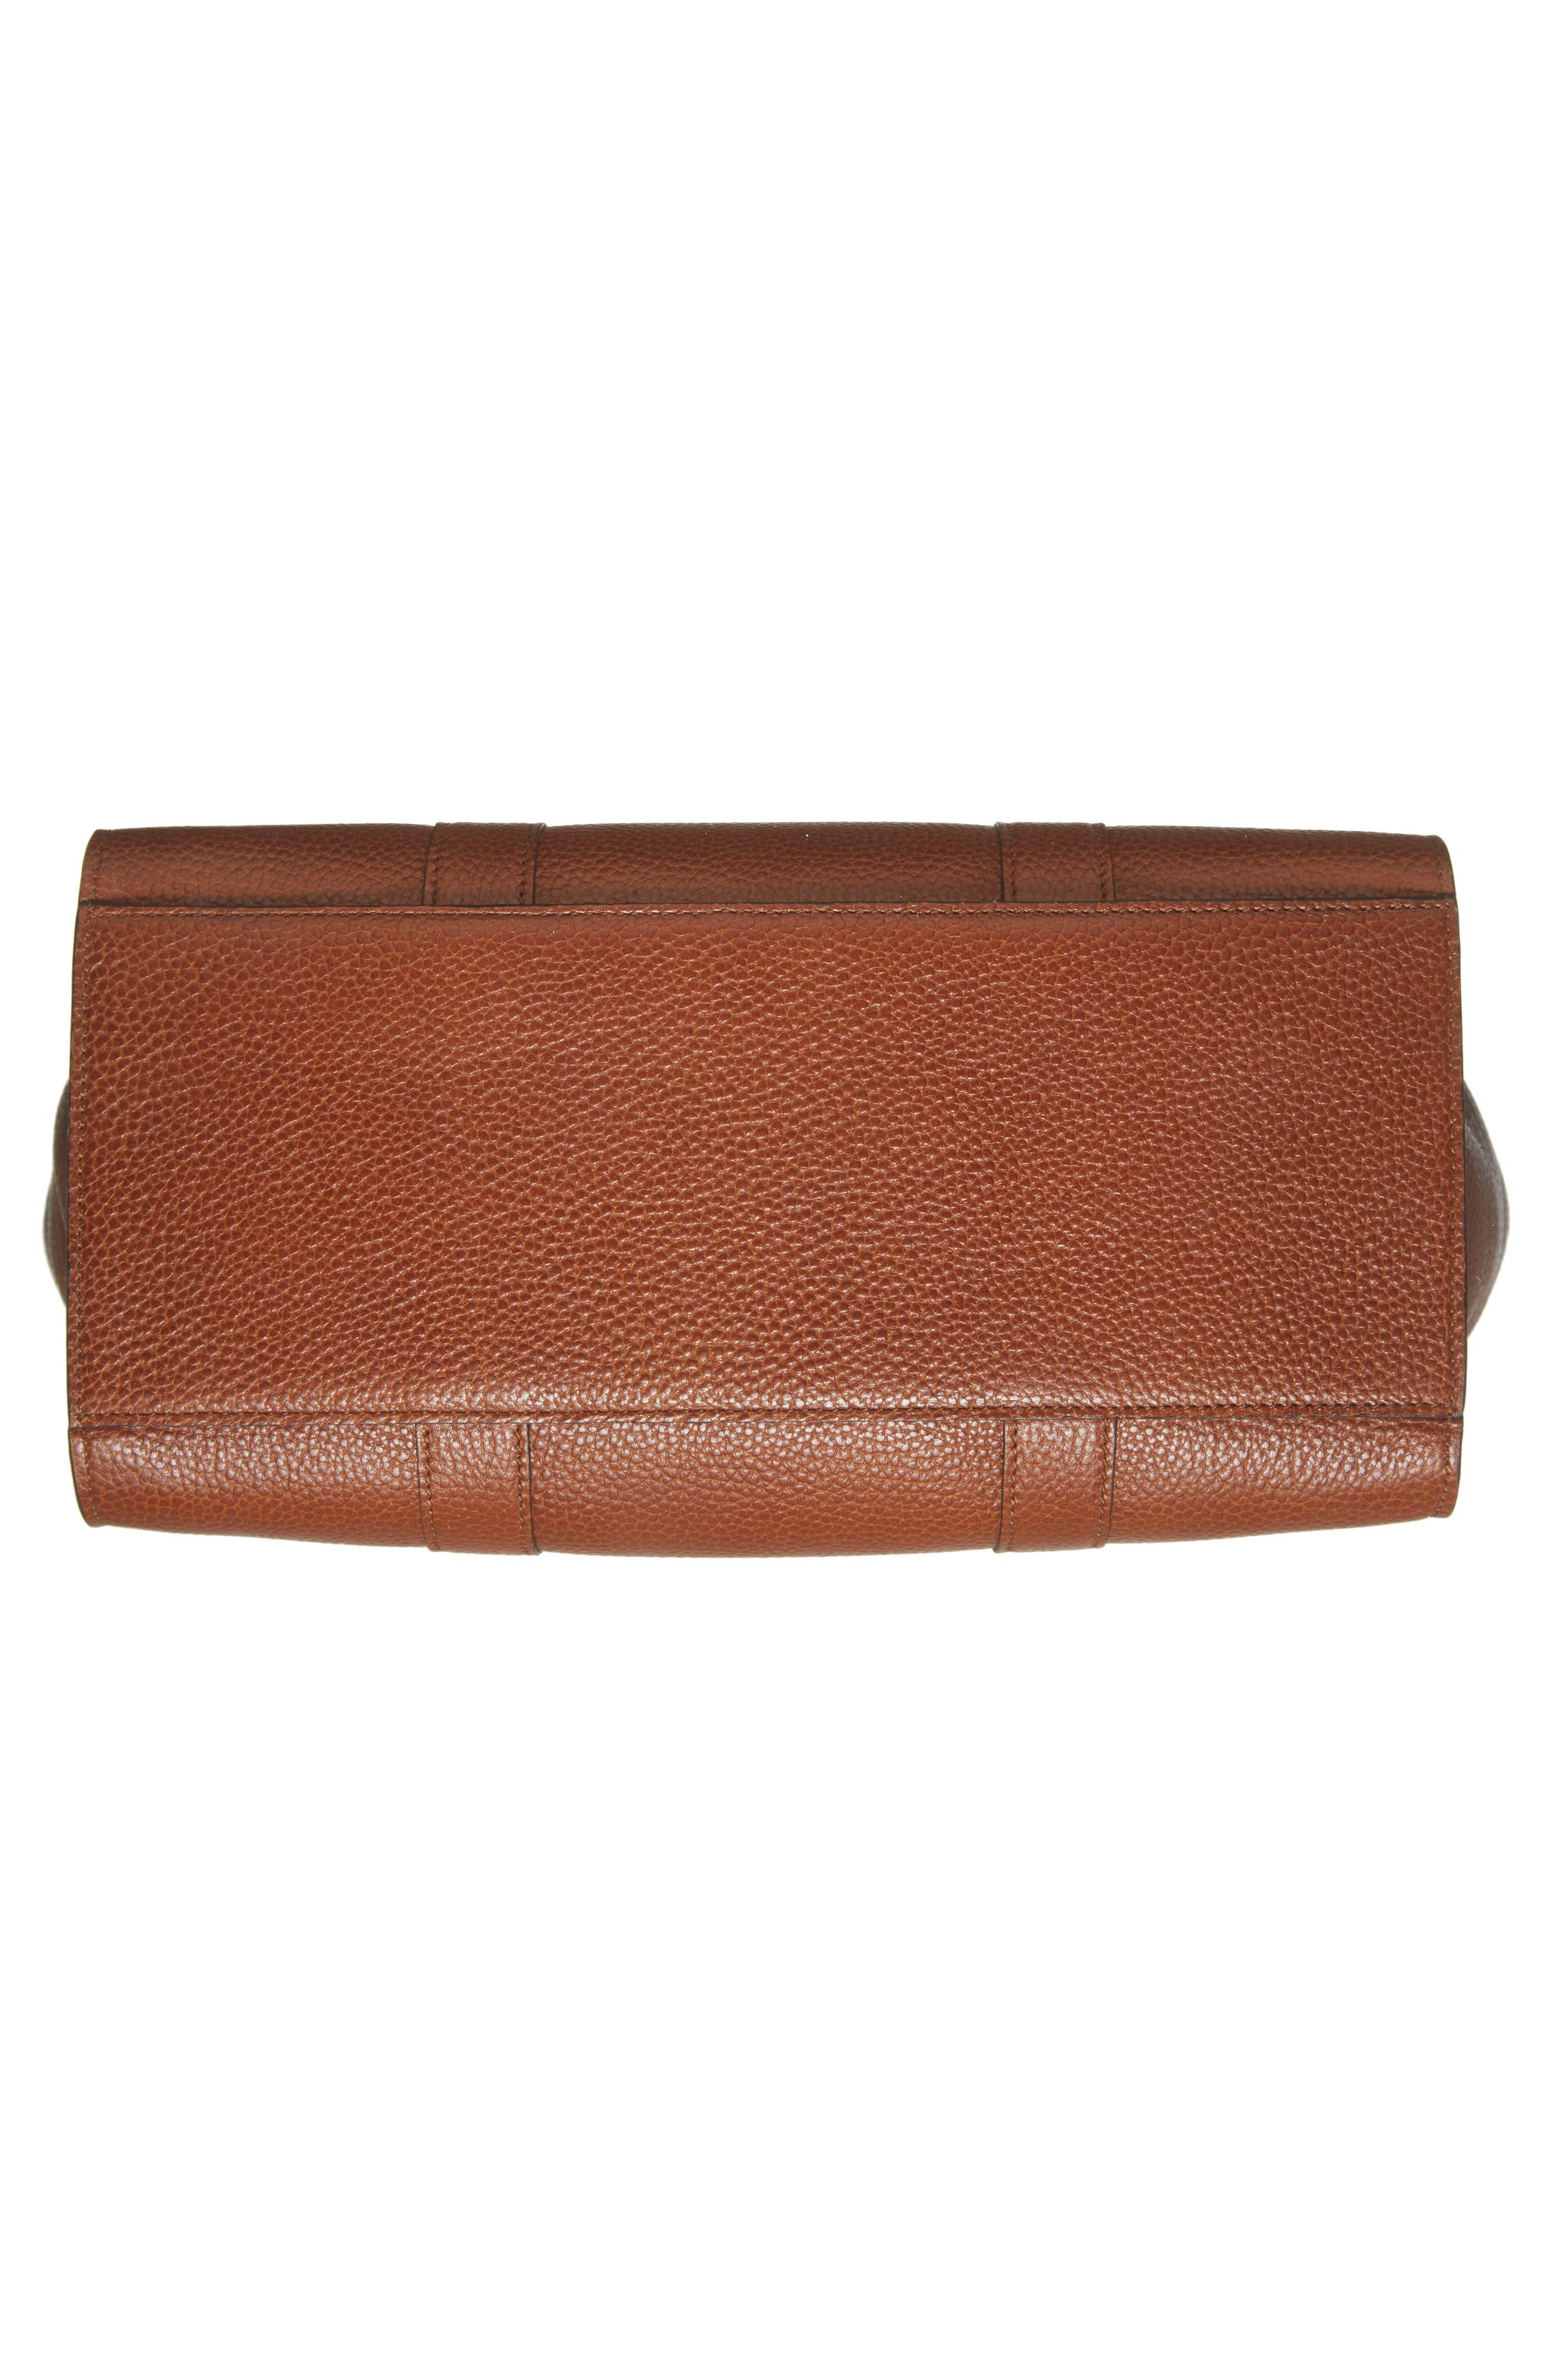 Bayswater Calfskin Leather Satchel,                             Alternate thumbnail 6, color,                             201